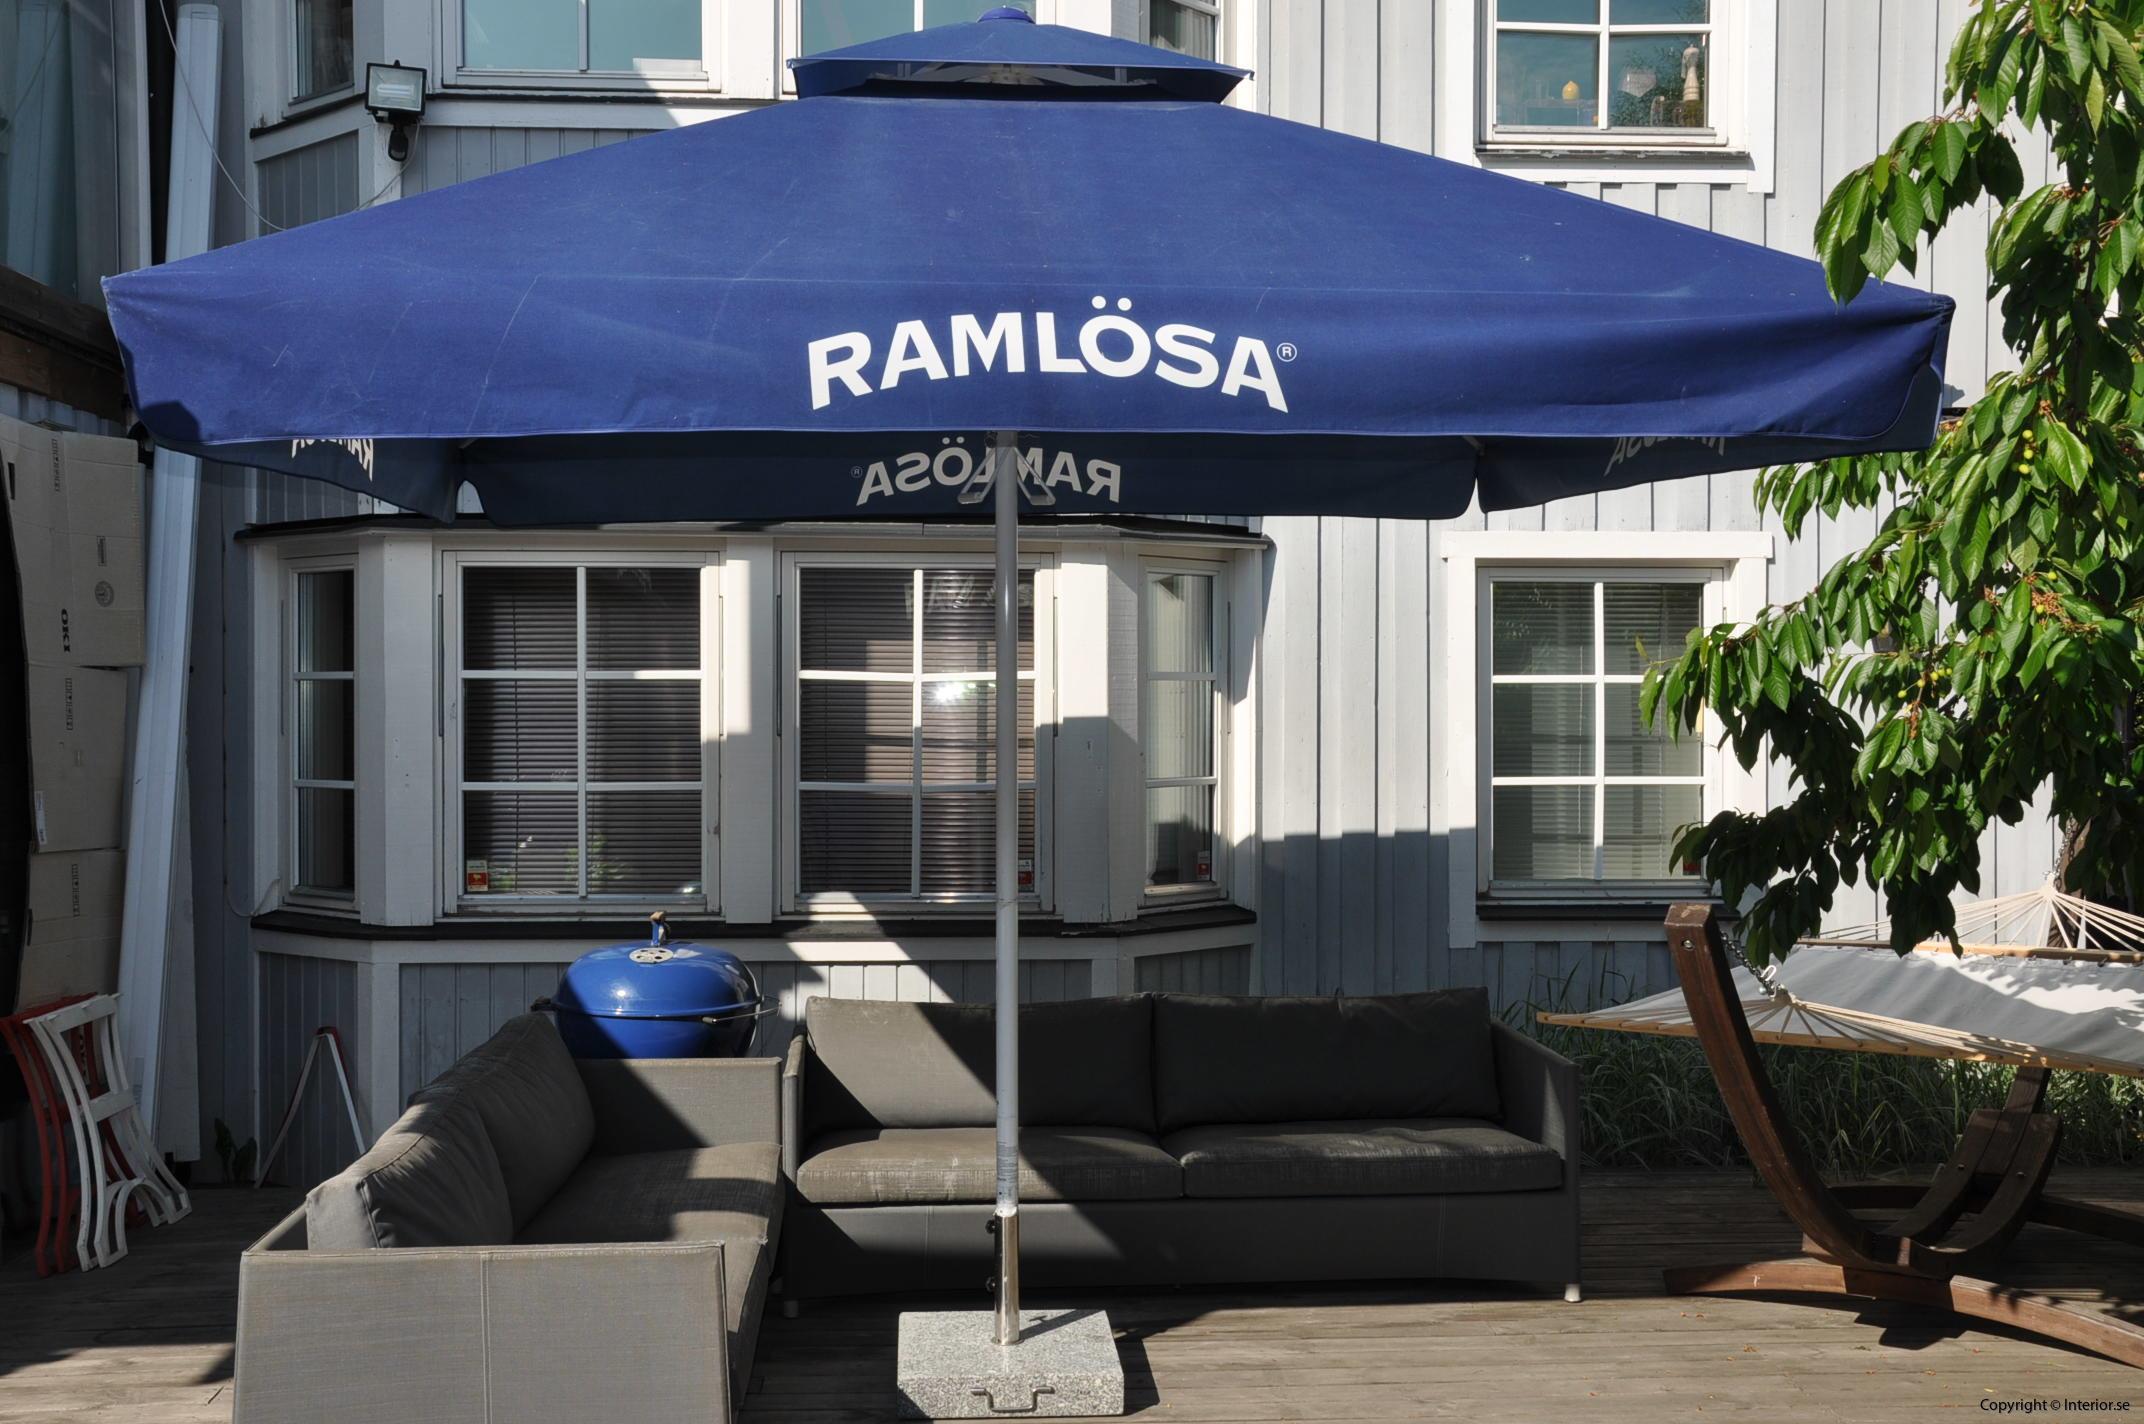 Hyr stora parasoll - 350 x 350 cm stockholm event